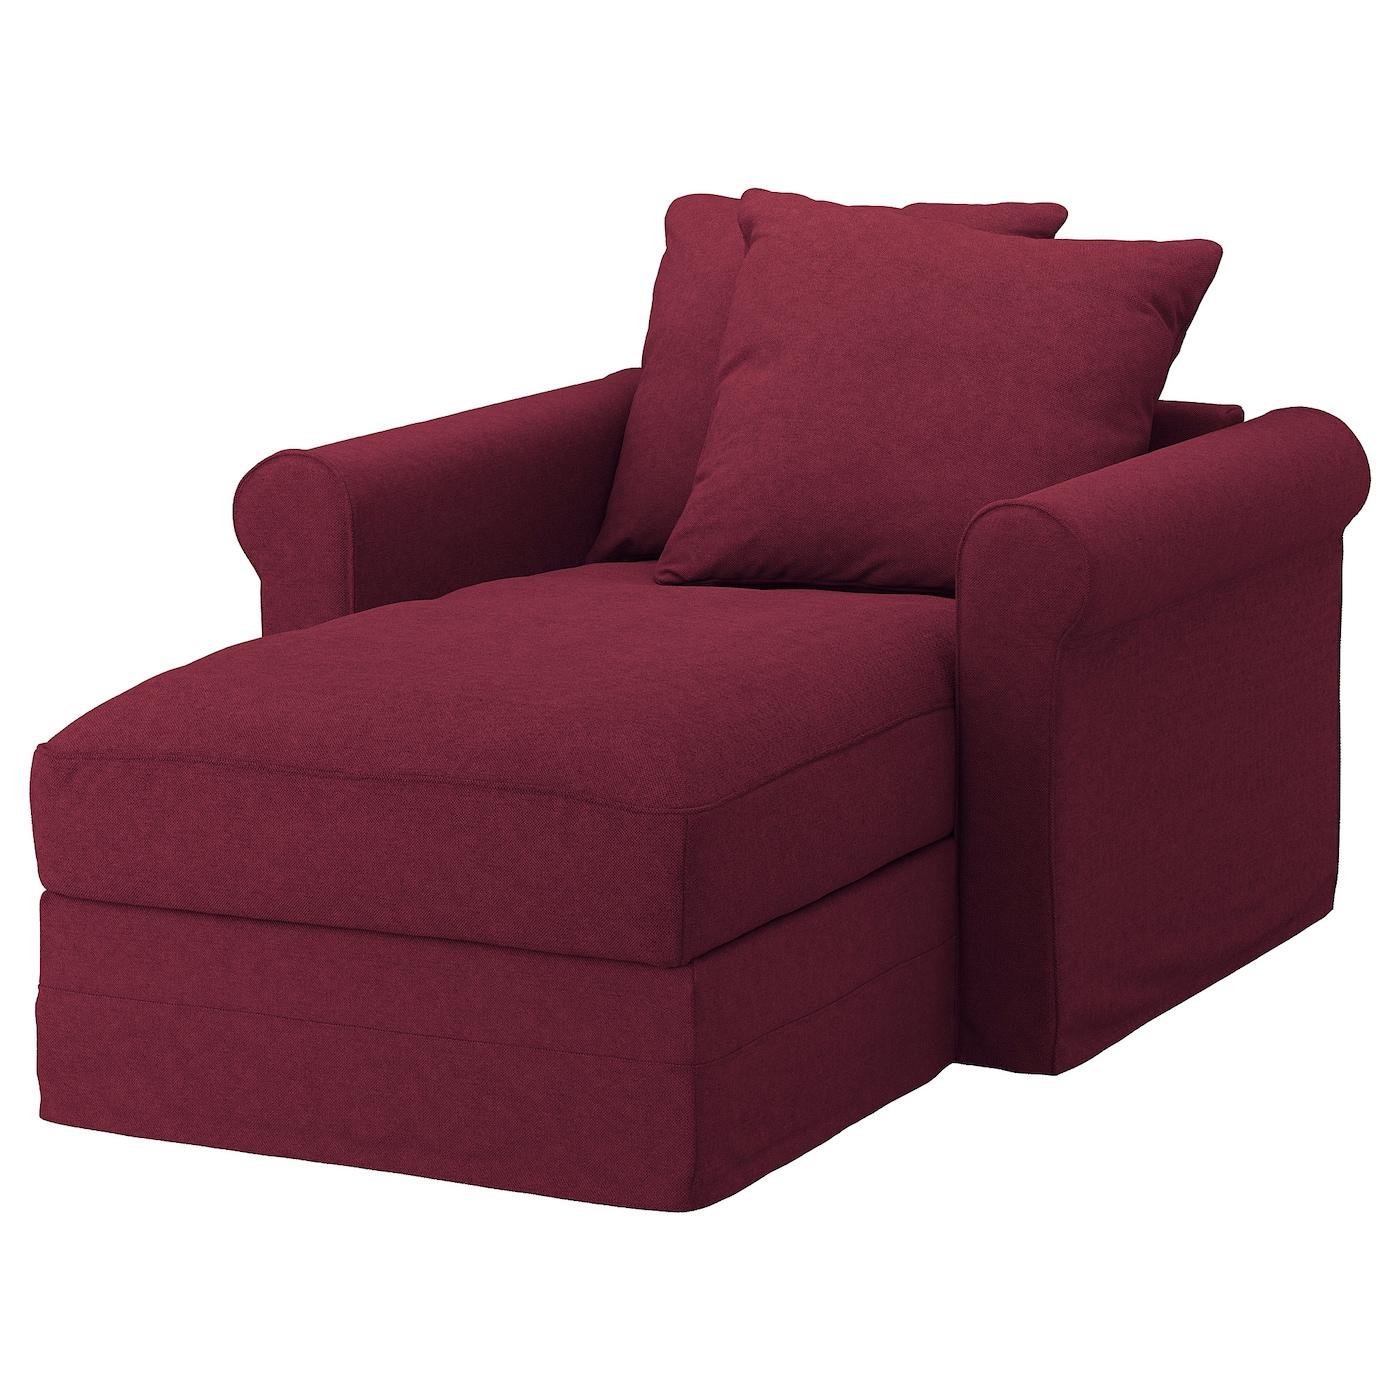 Fabric chaise longues ikea ireland dublin - Copridivano chaise longue ikea ...